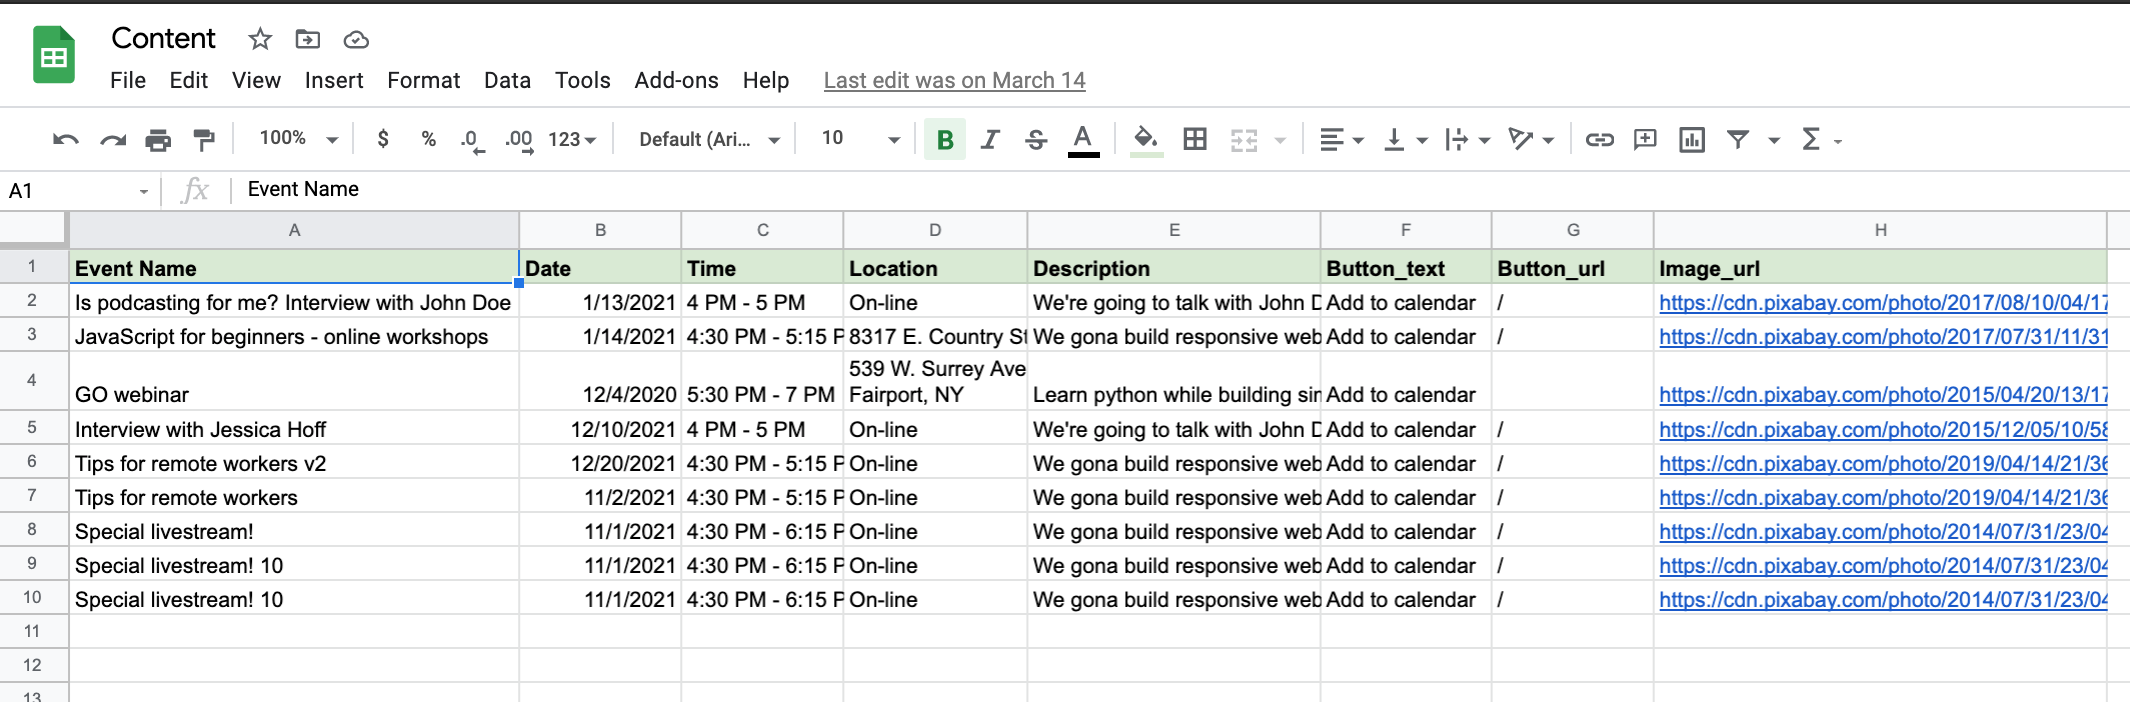 Example Google Sheet